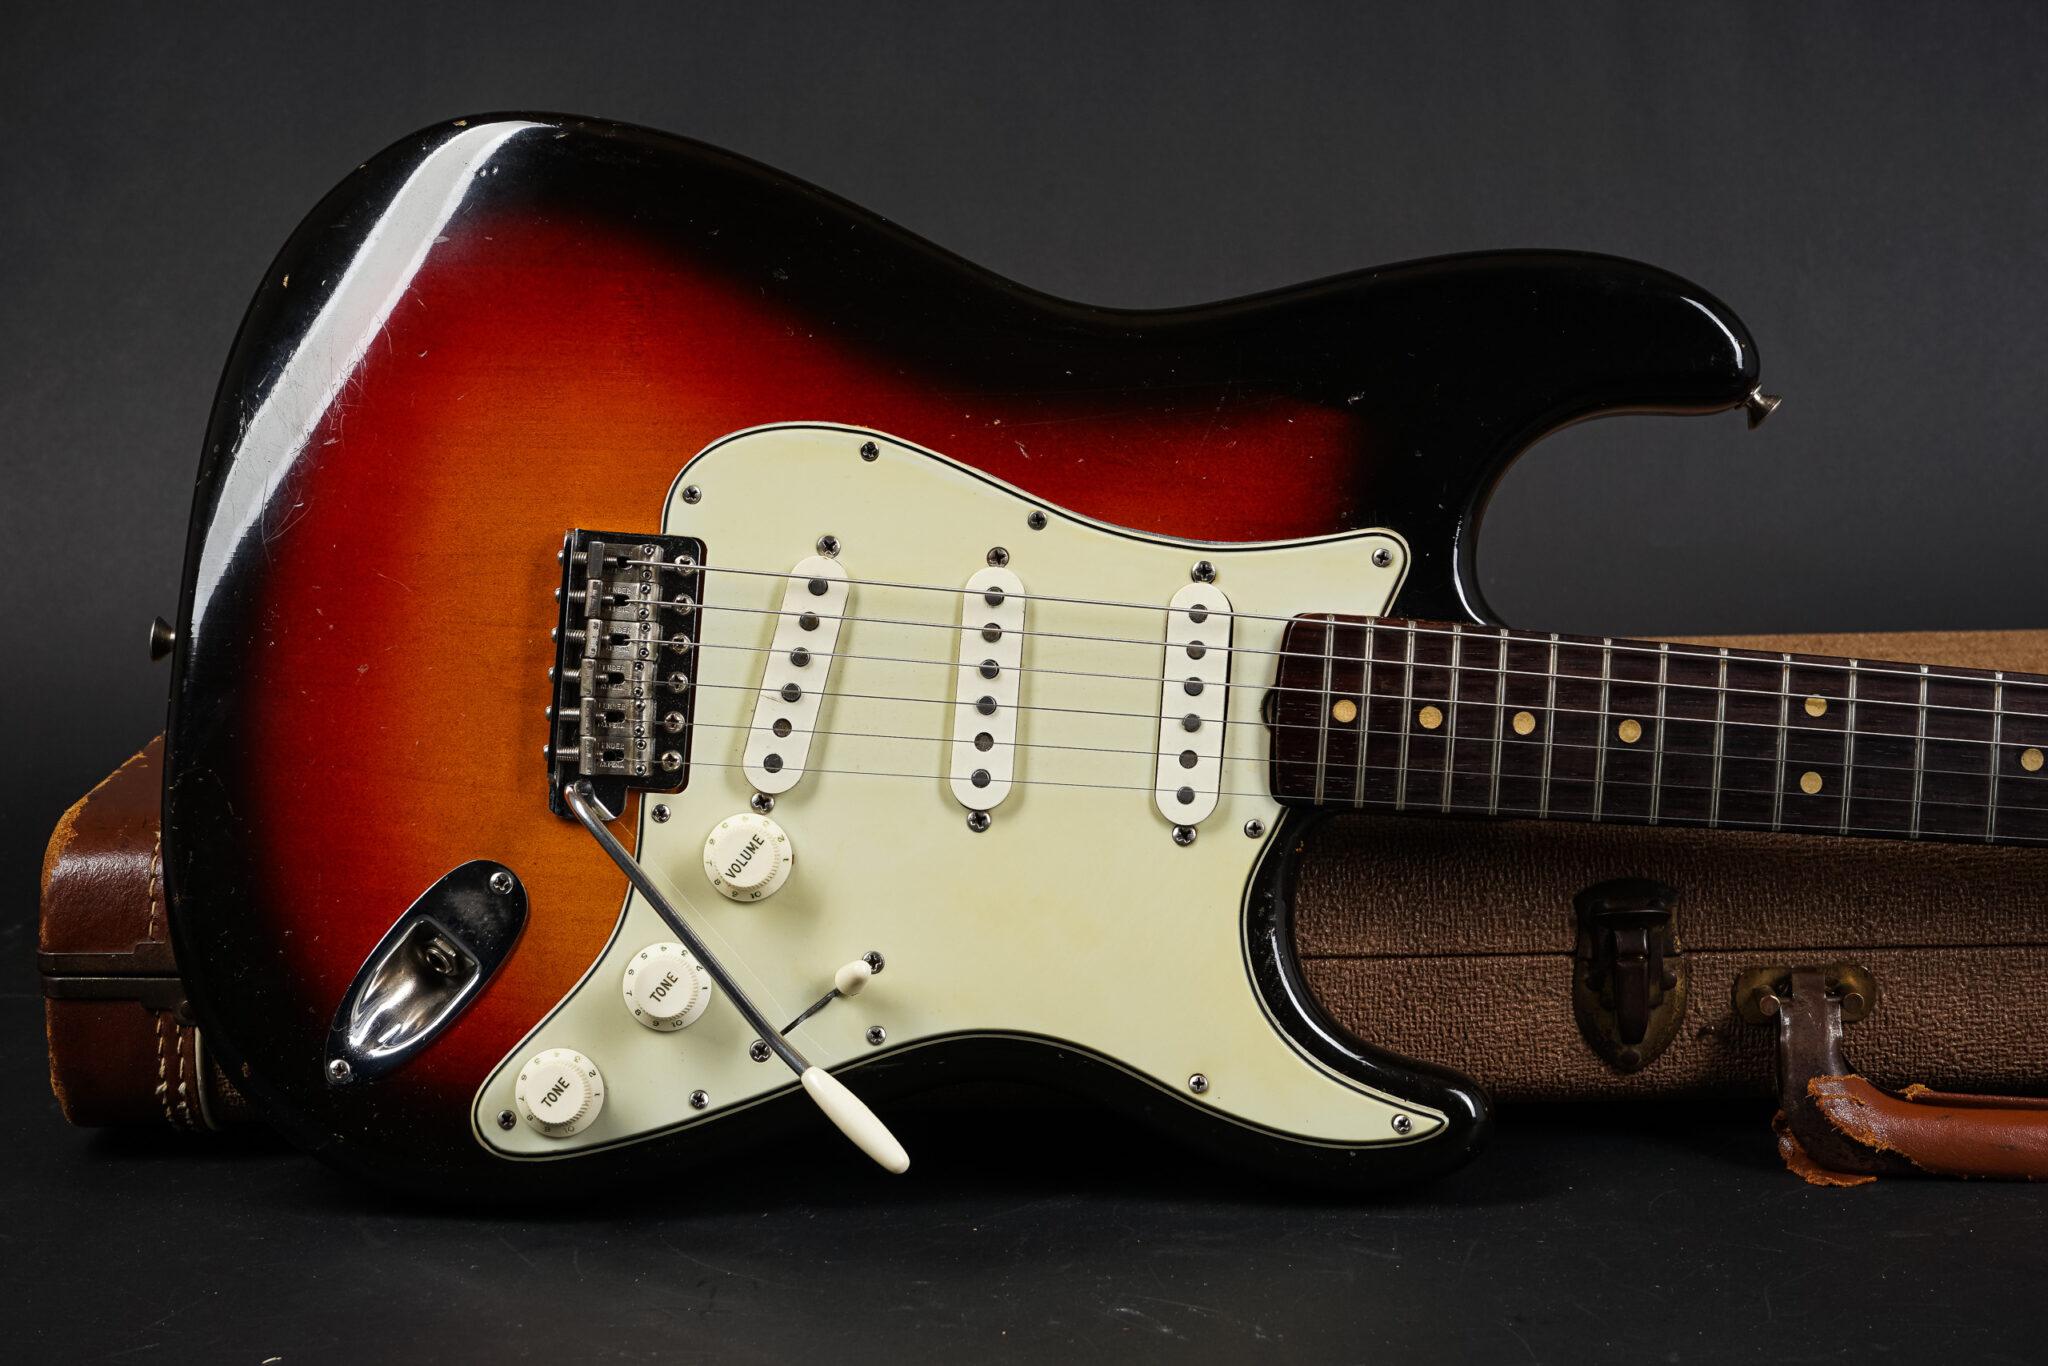 https://guitarpoint.de/app/uploads/products/1964-fender-stratocaster-3-tone-sunburst-lightweight/1964-Fender-Stratocaster-Sunburst-L36425-9-2048x1366.jpg